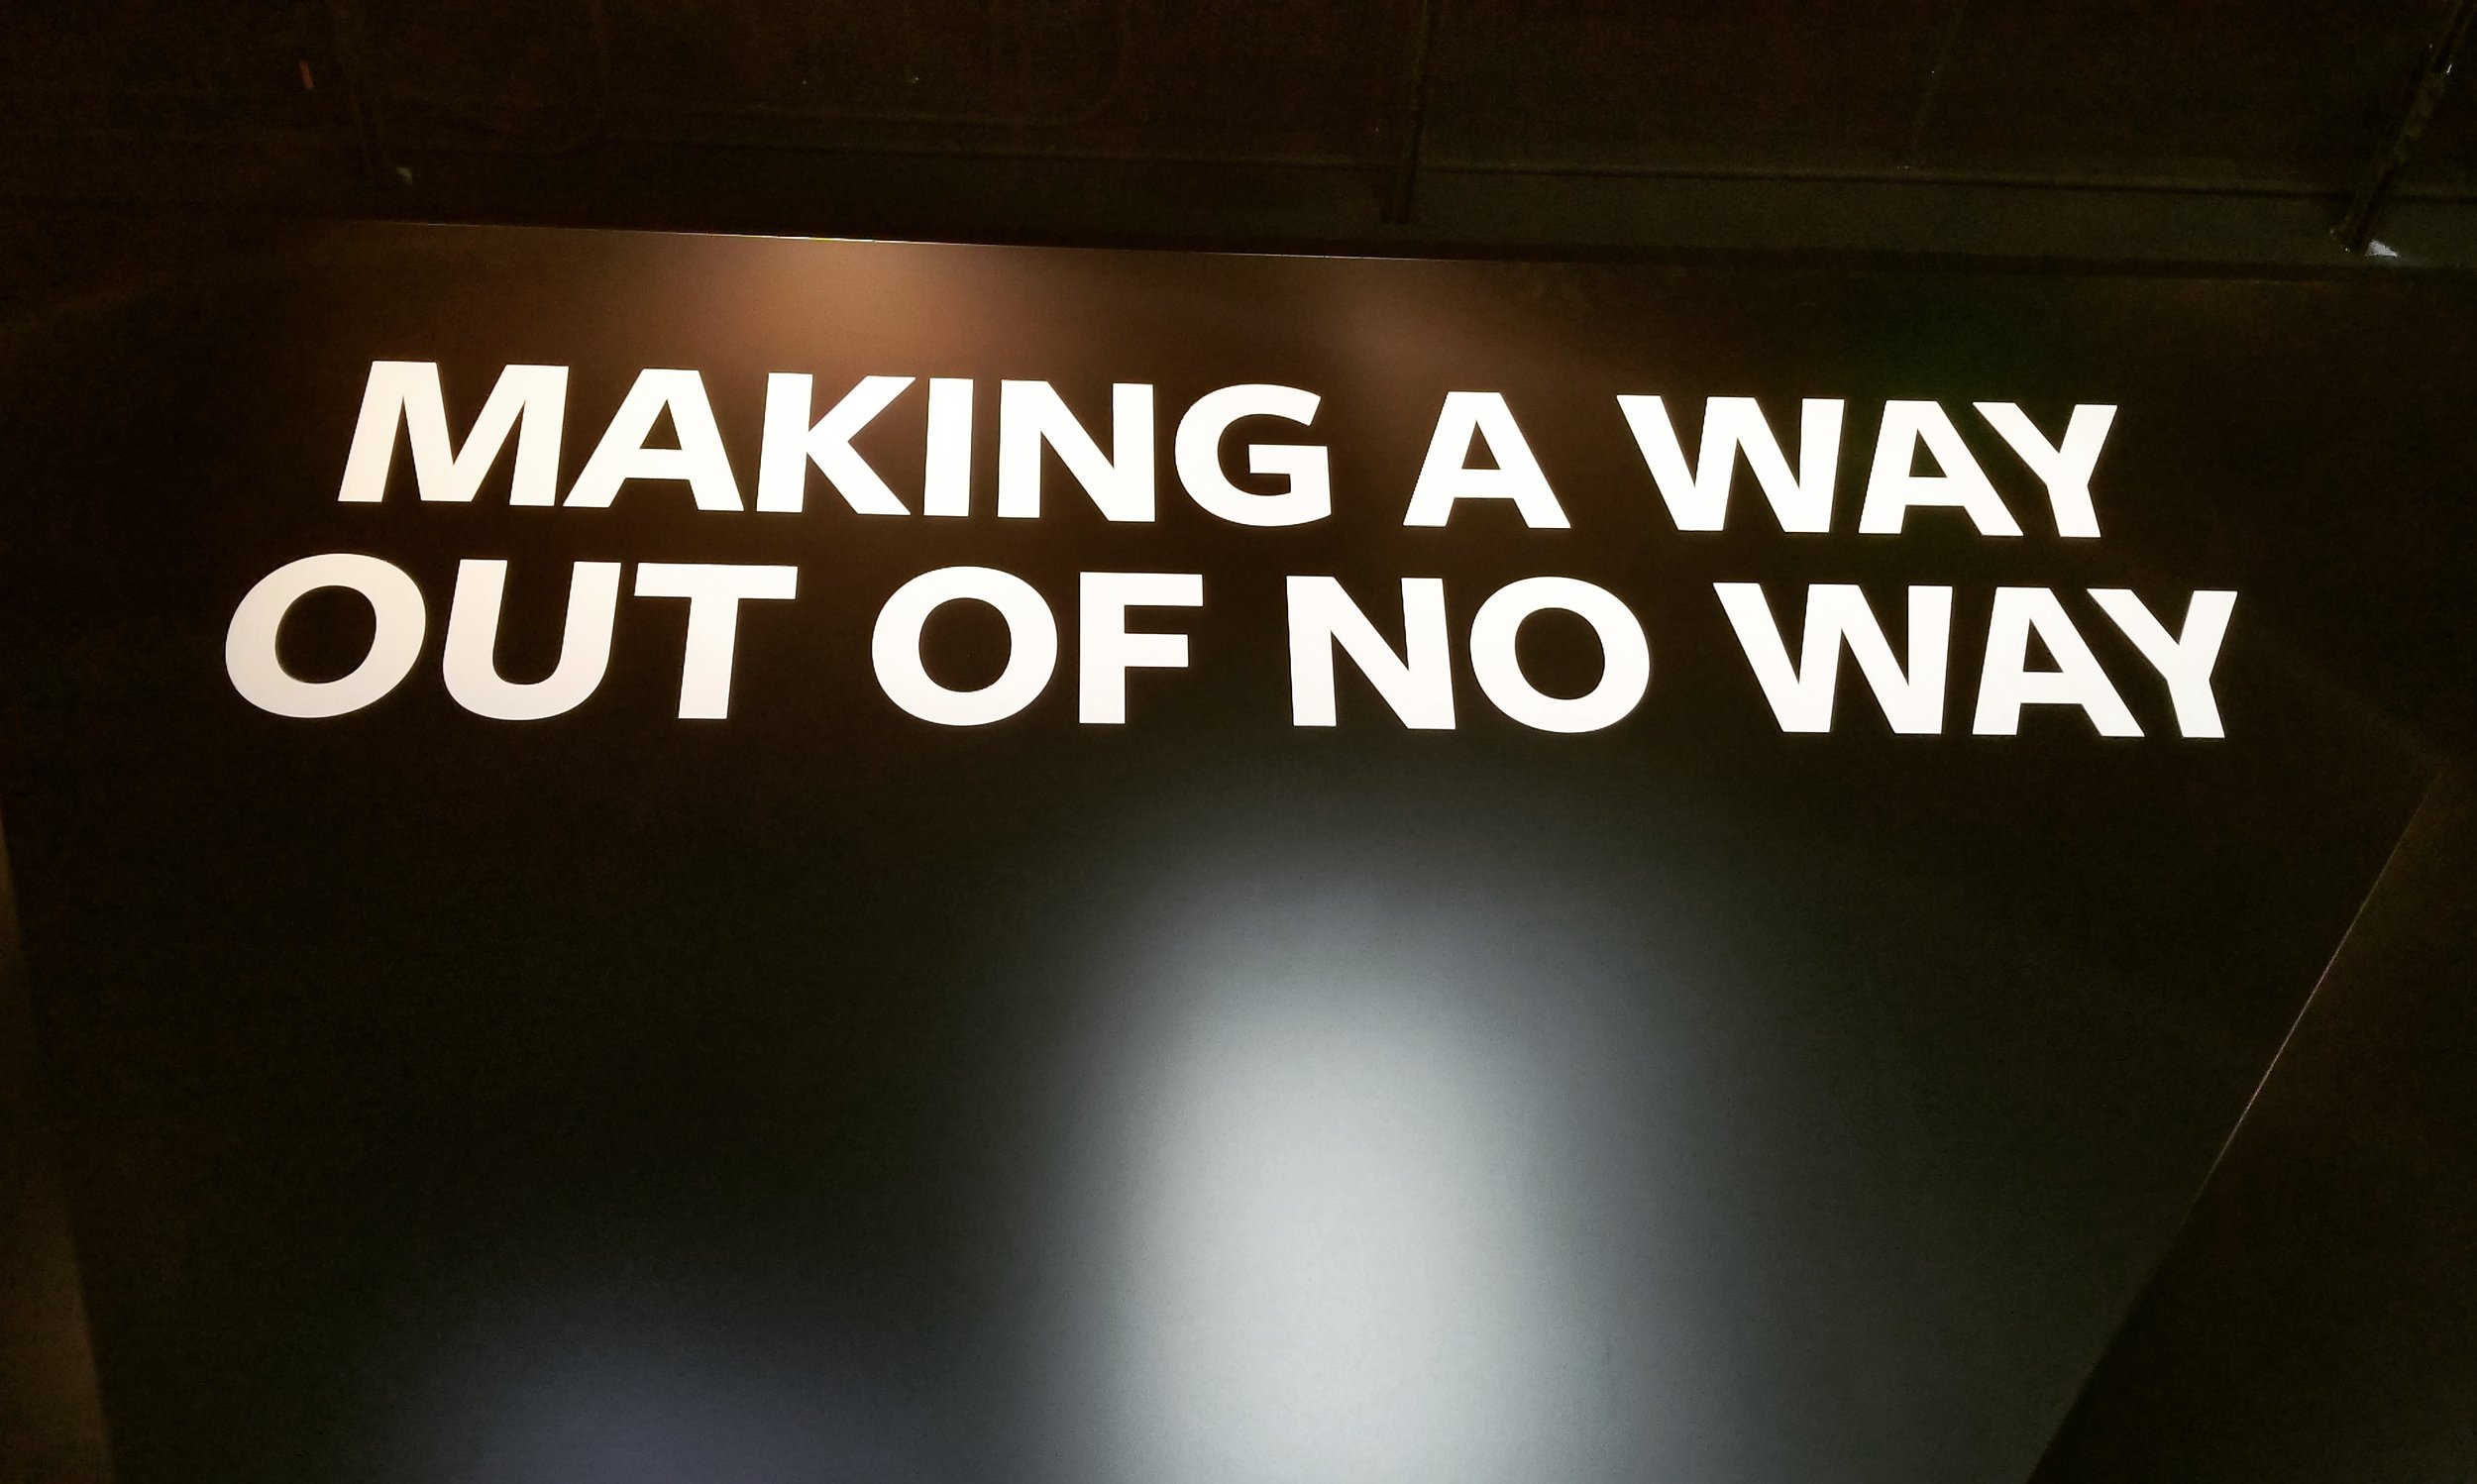 Making a way out of no way.